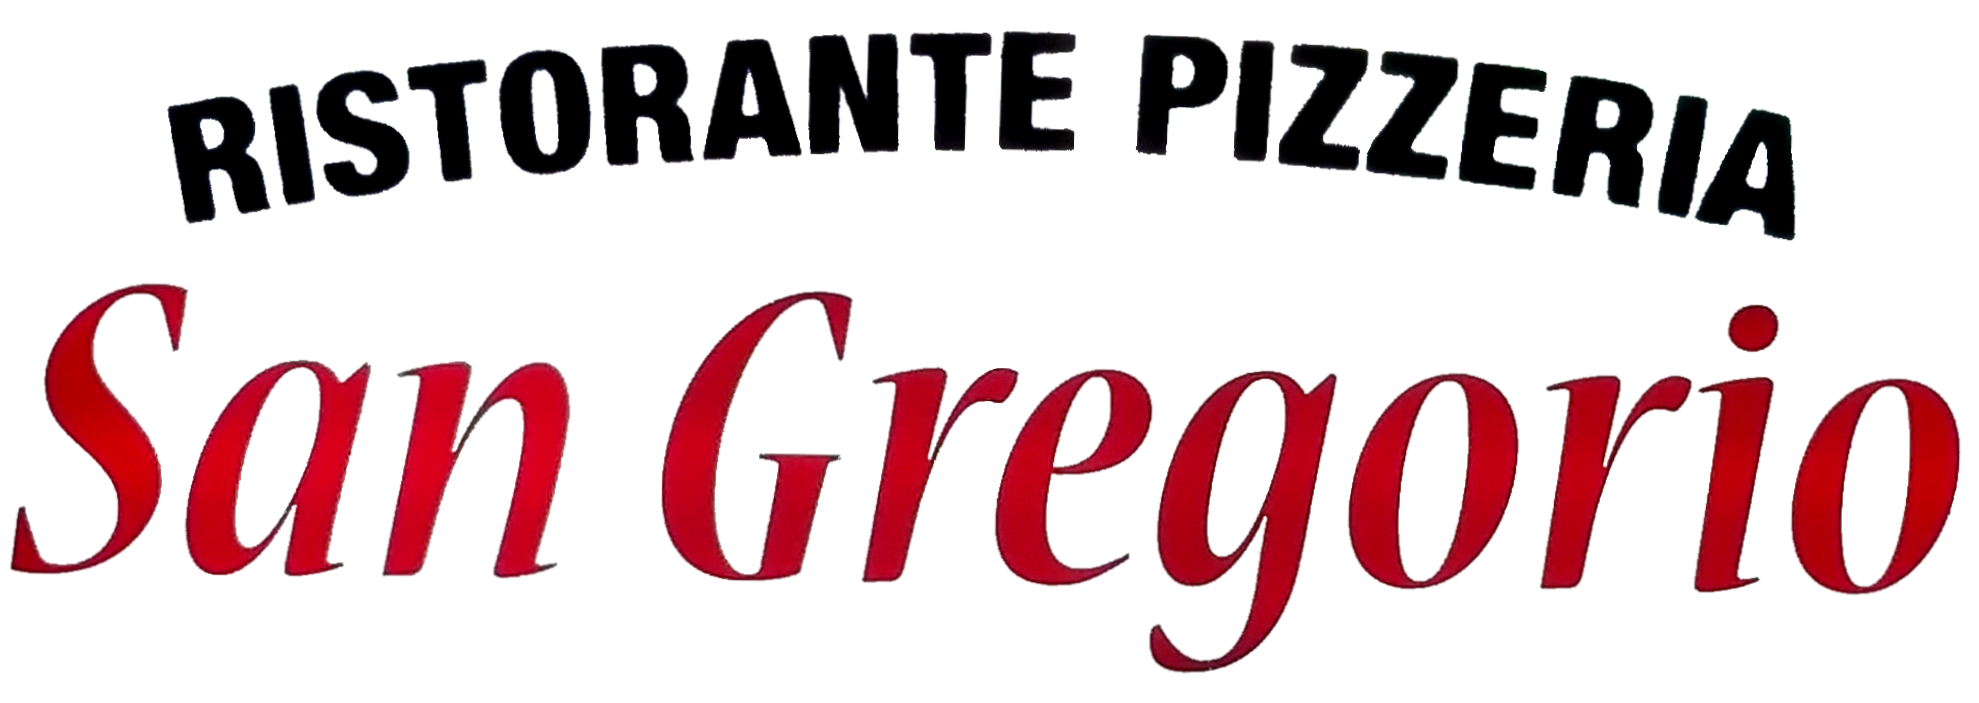 Ristorante San Gregorio - Correggio (Reggio Emilia)